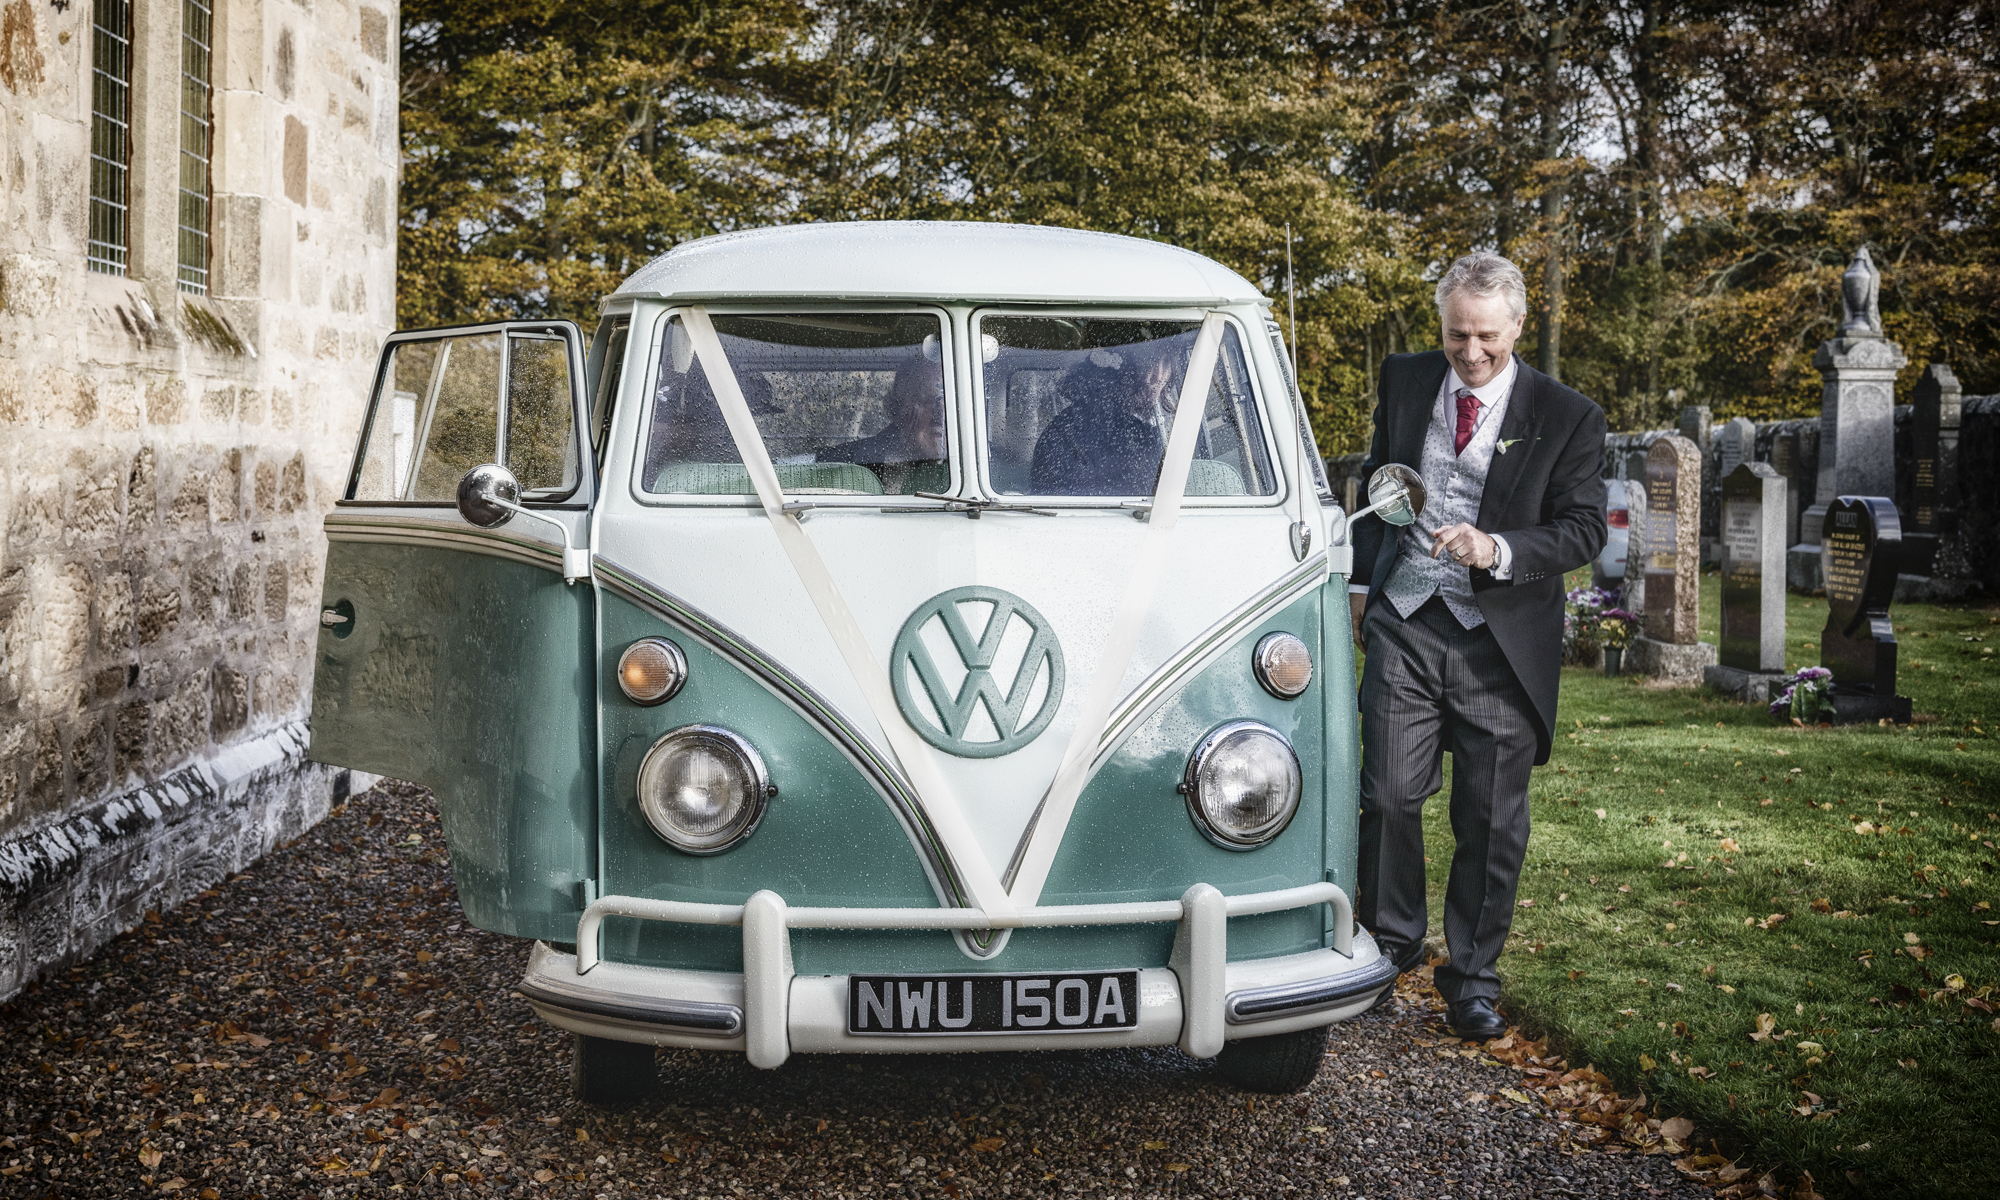 Wedding Photographer in the Highlands of Scotland - Ewan Mathers